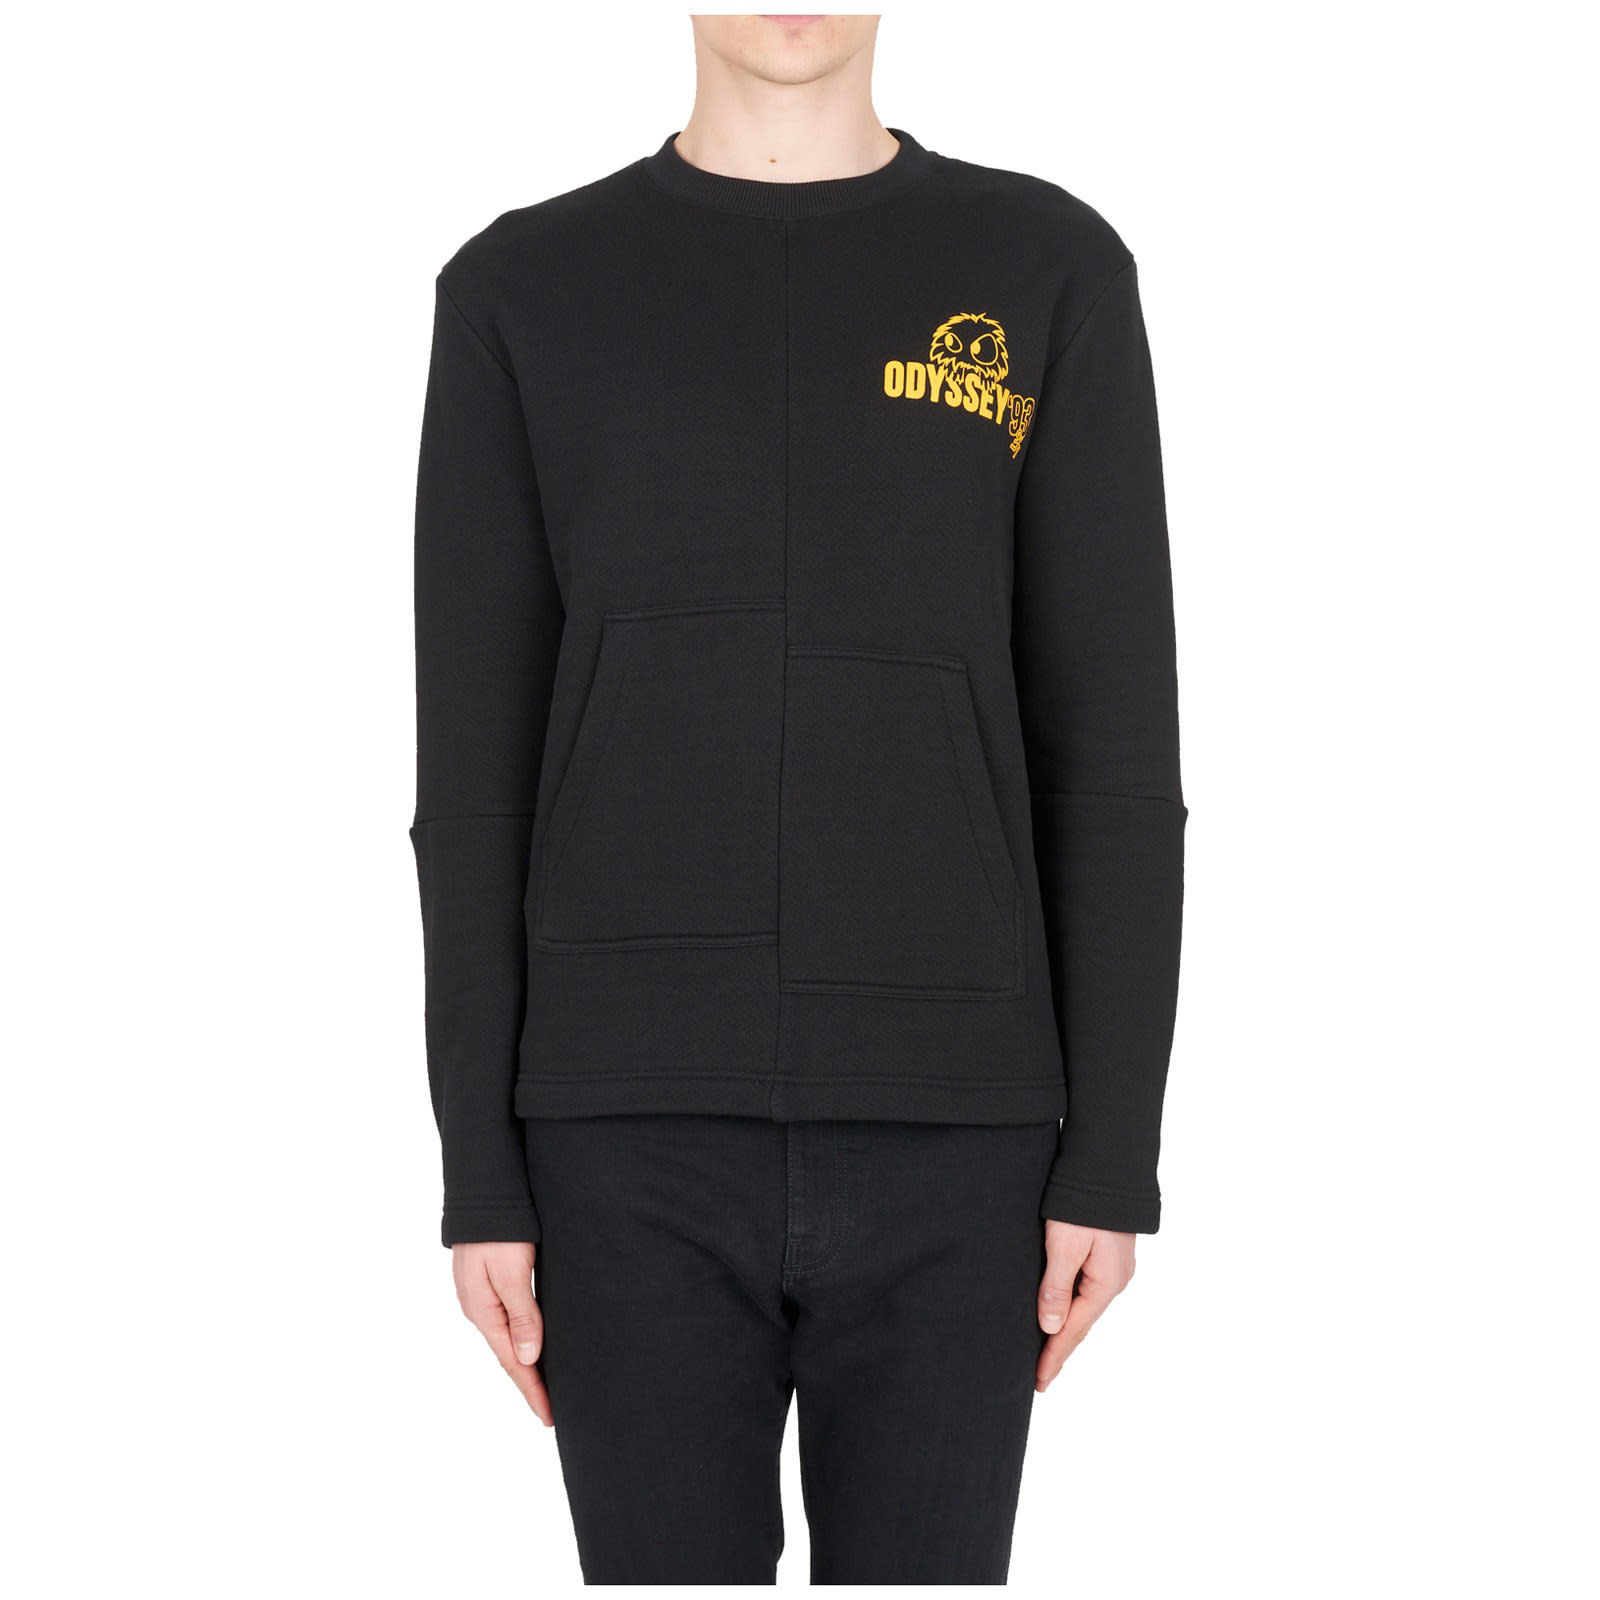 Mcq Swallow Odyssey 93 Sweatshirt